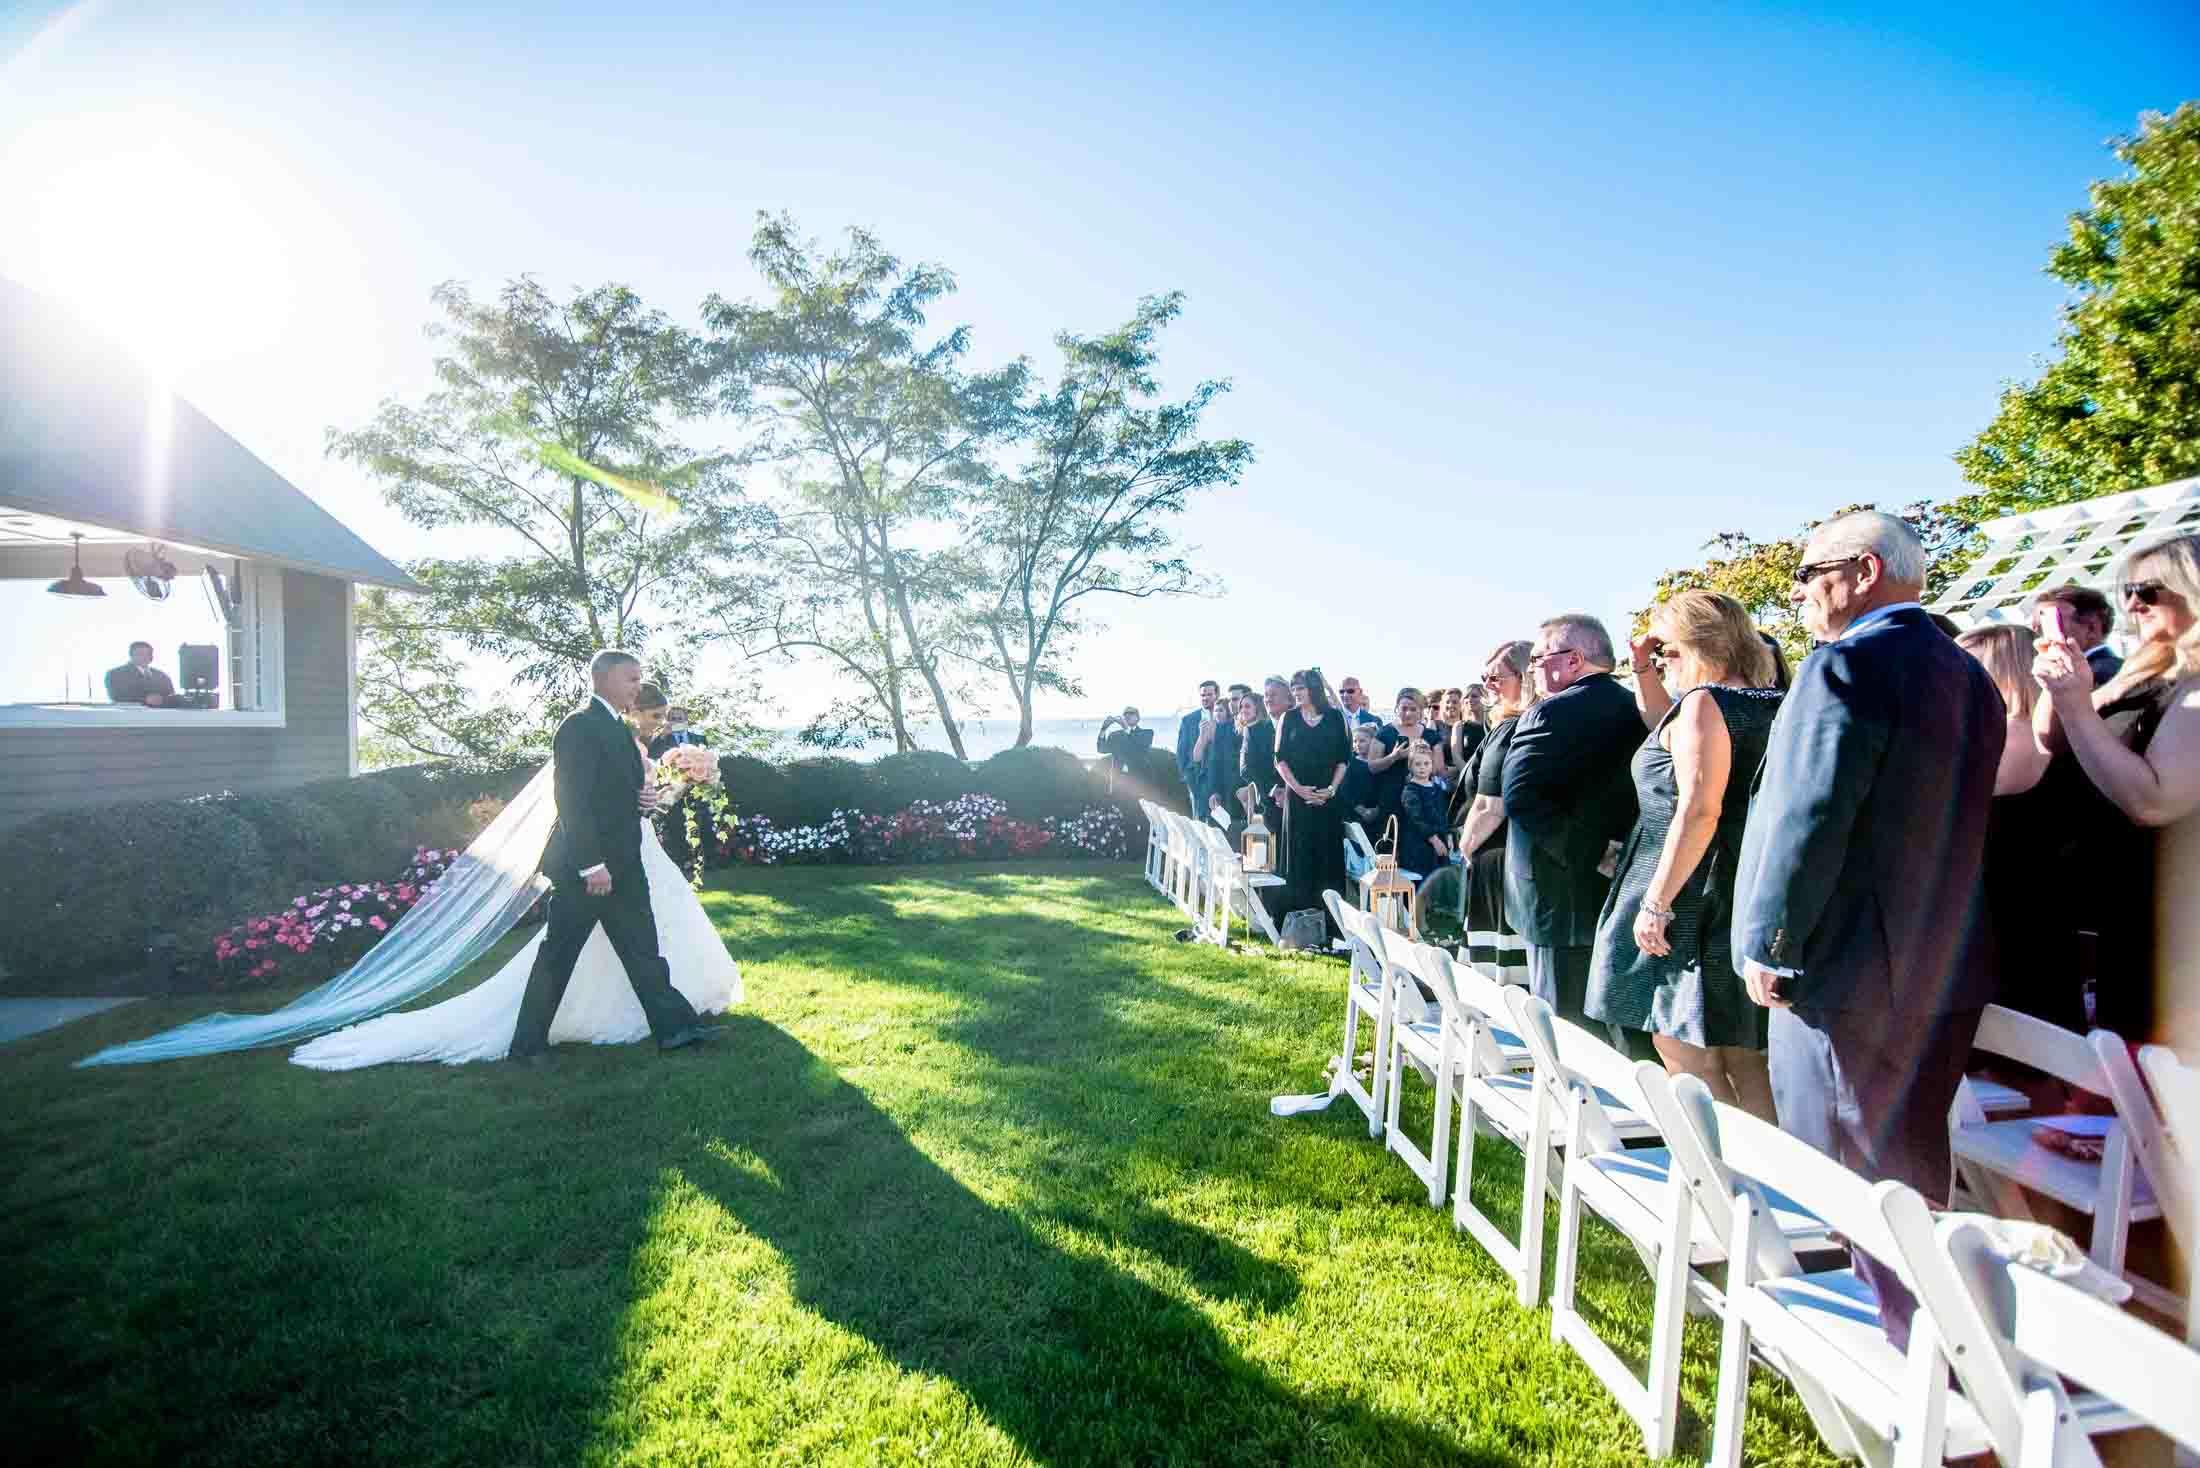 dc+metro+wedding+photographer+vadym+guliuk+photography+wedding+ceremony-2025.jpg